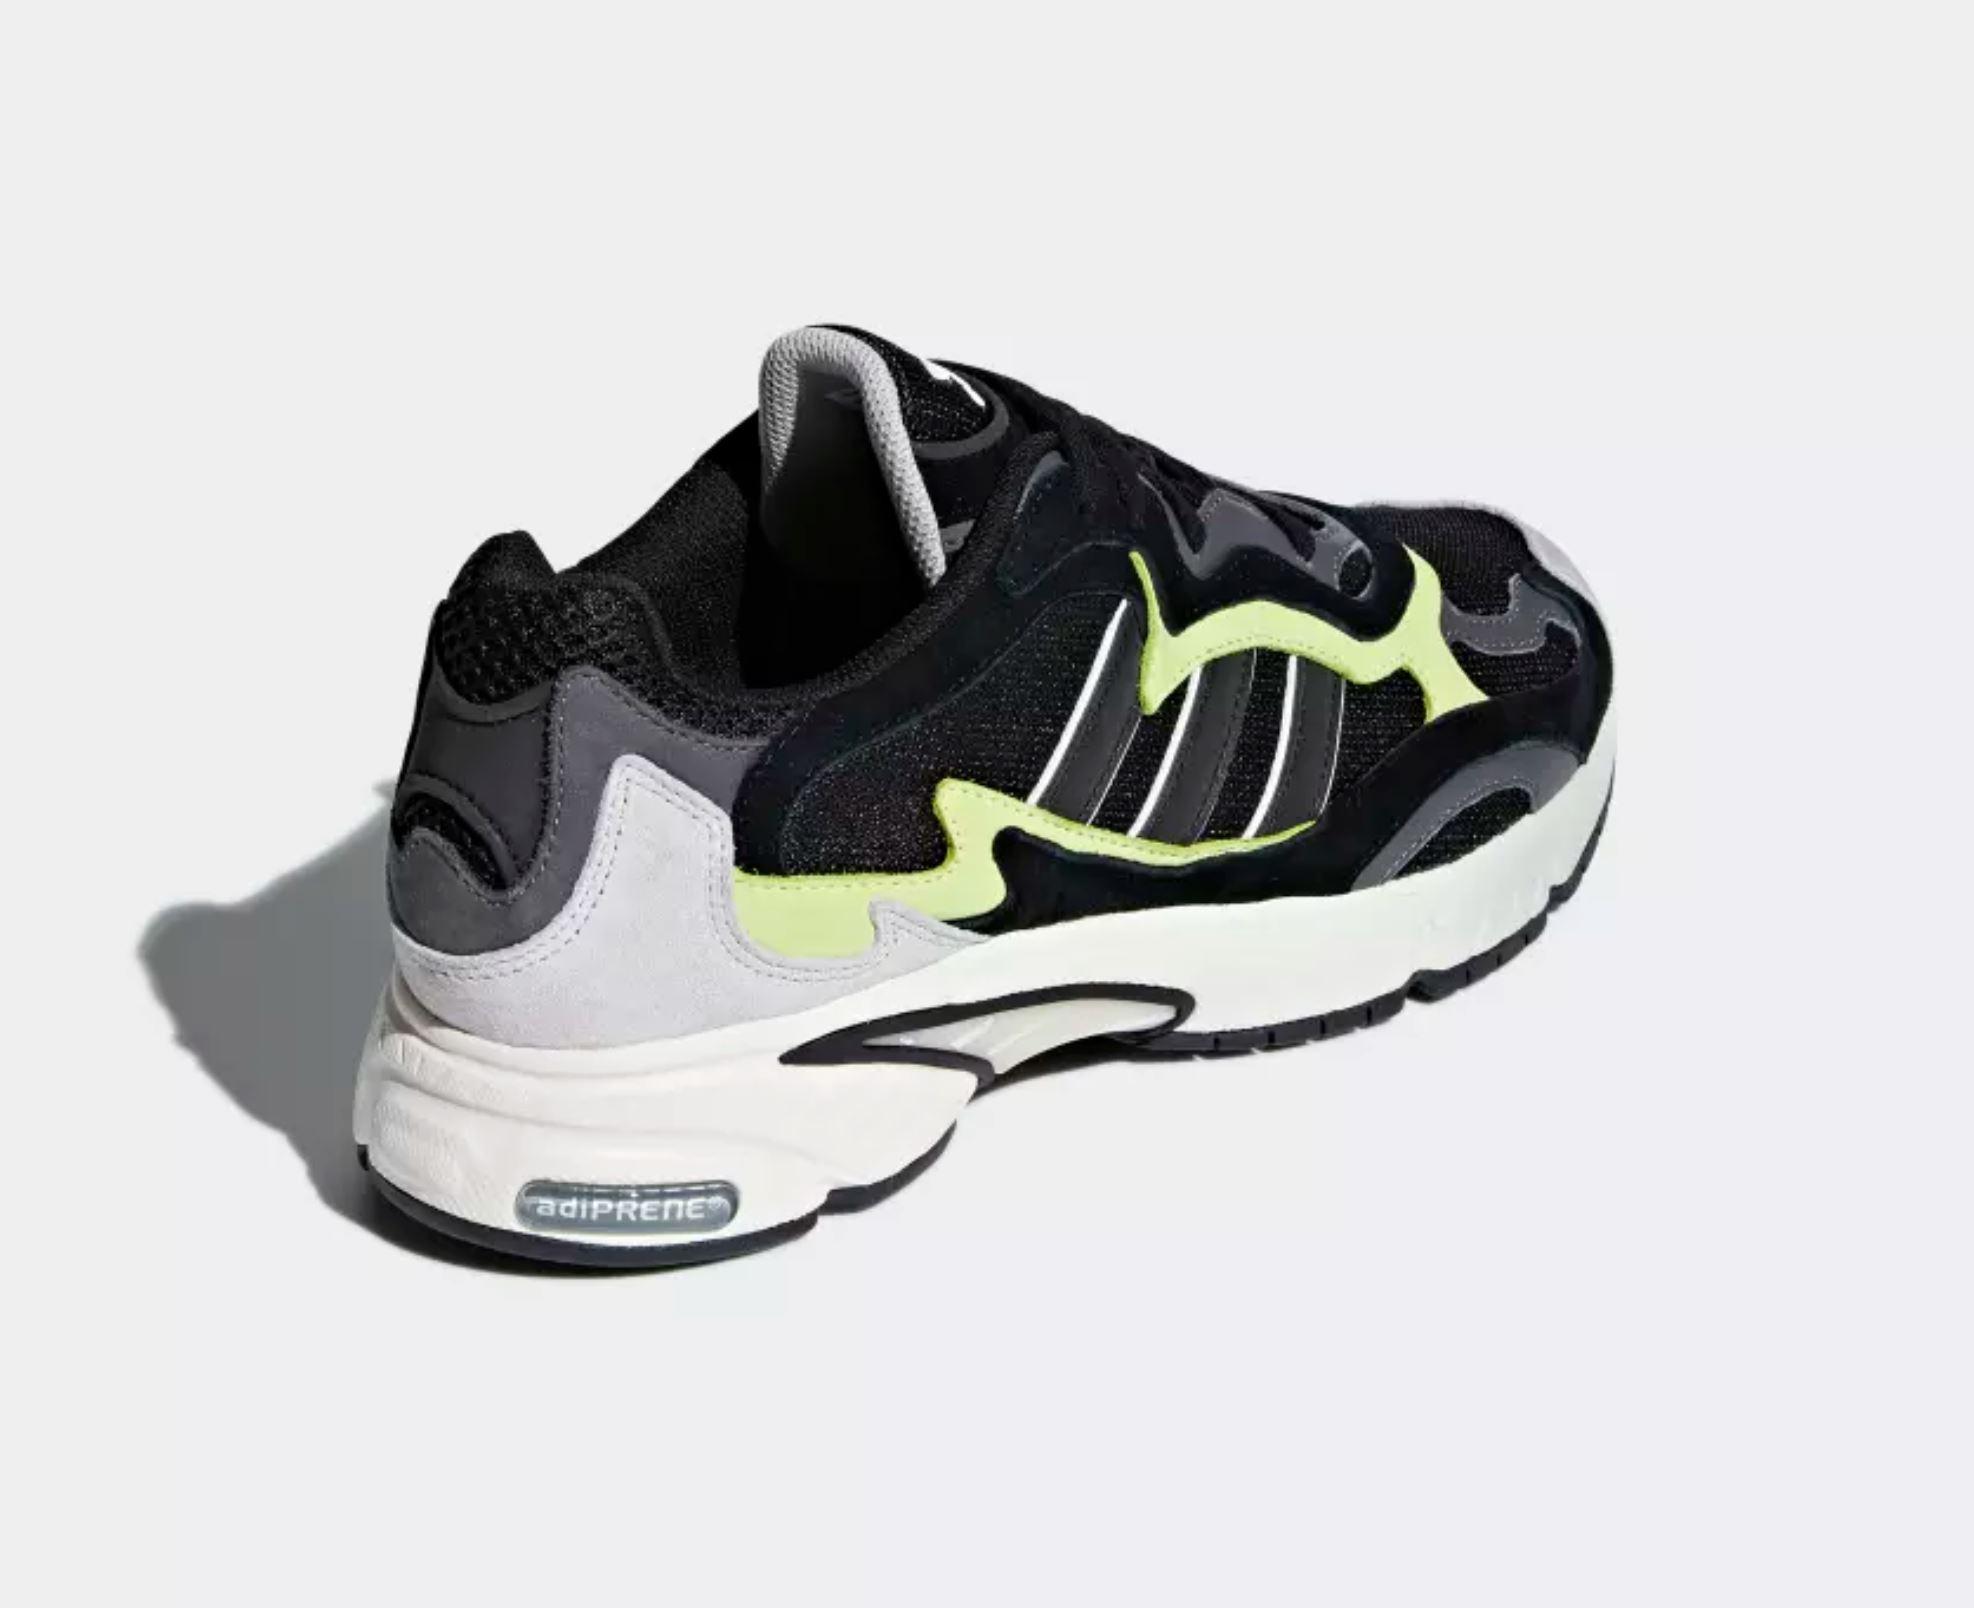 Espectáculo Asado despensa  The adidas Temper Run is a New Dad Shoe - WearTesters